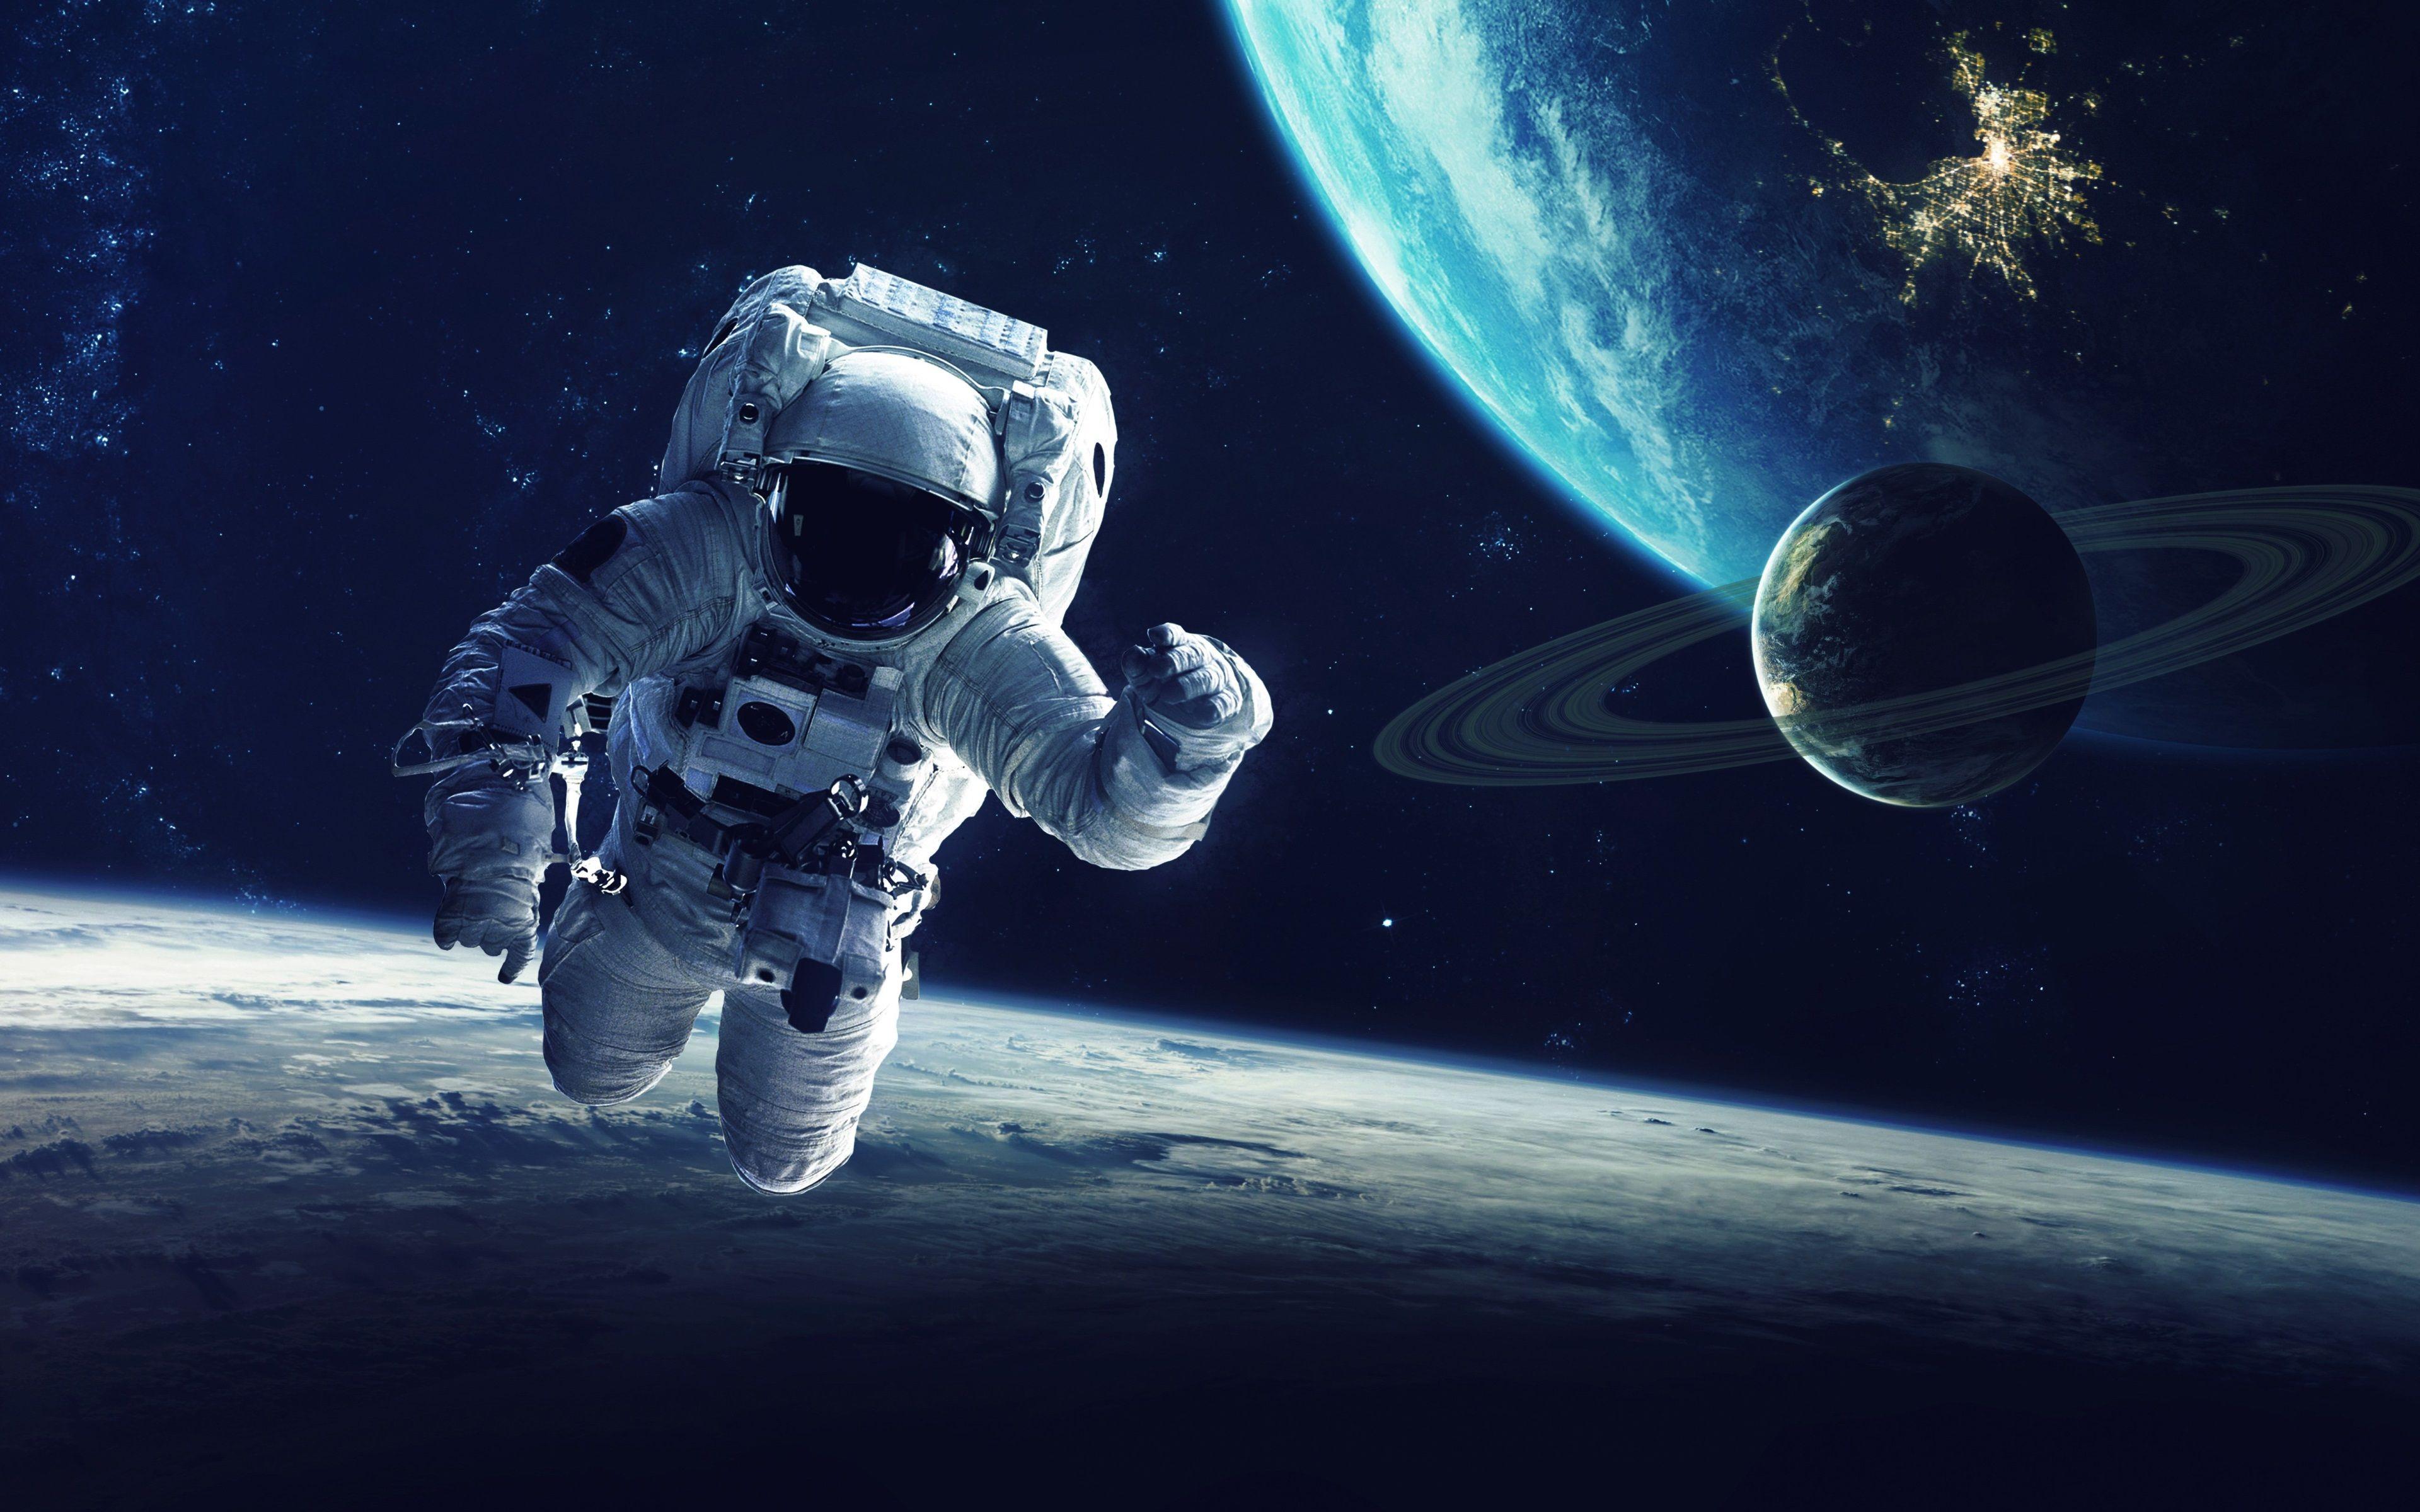 3840x2400 astronaut 4k wallpaper in hd quality